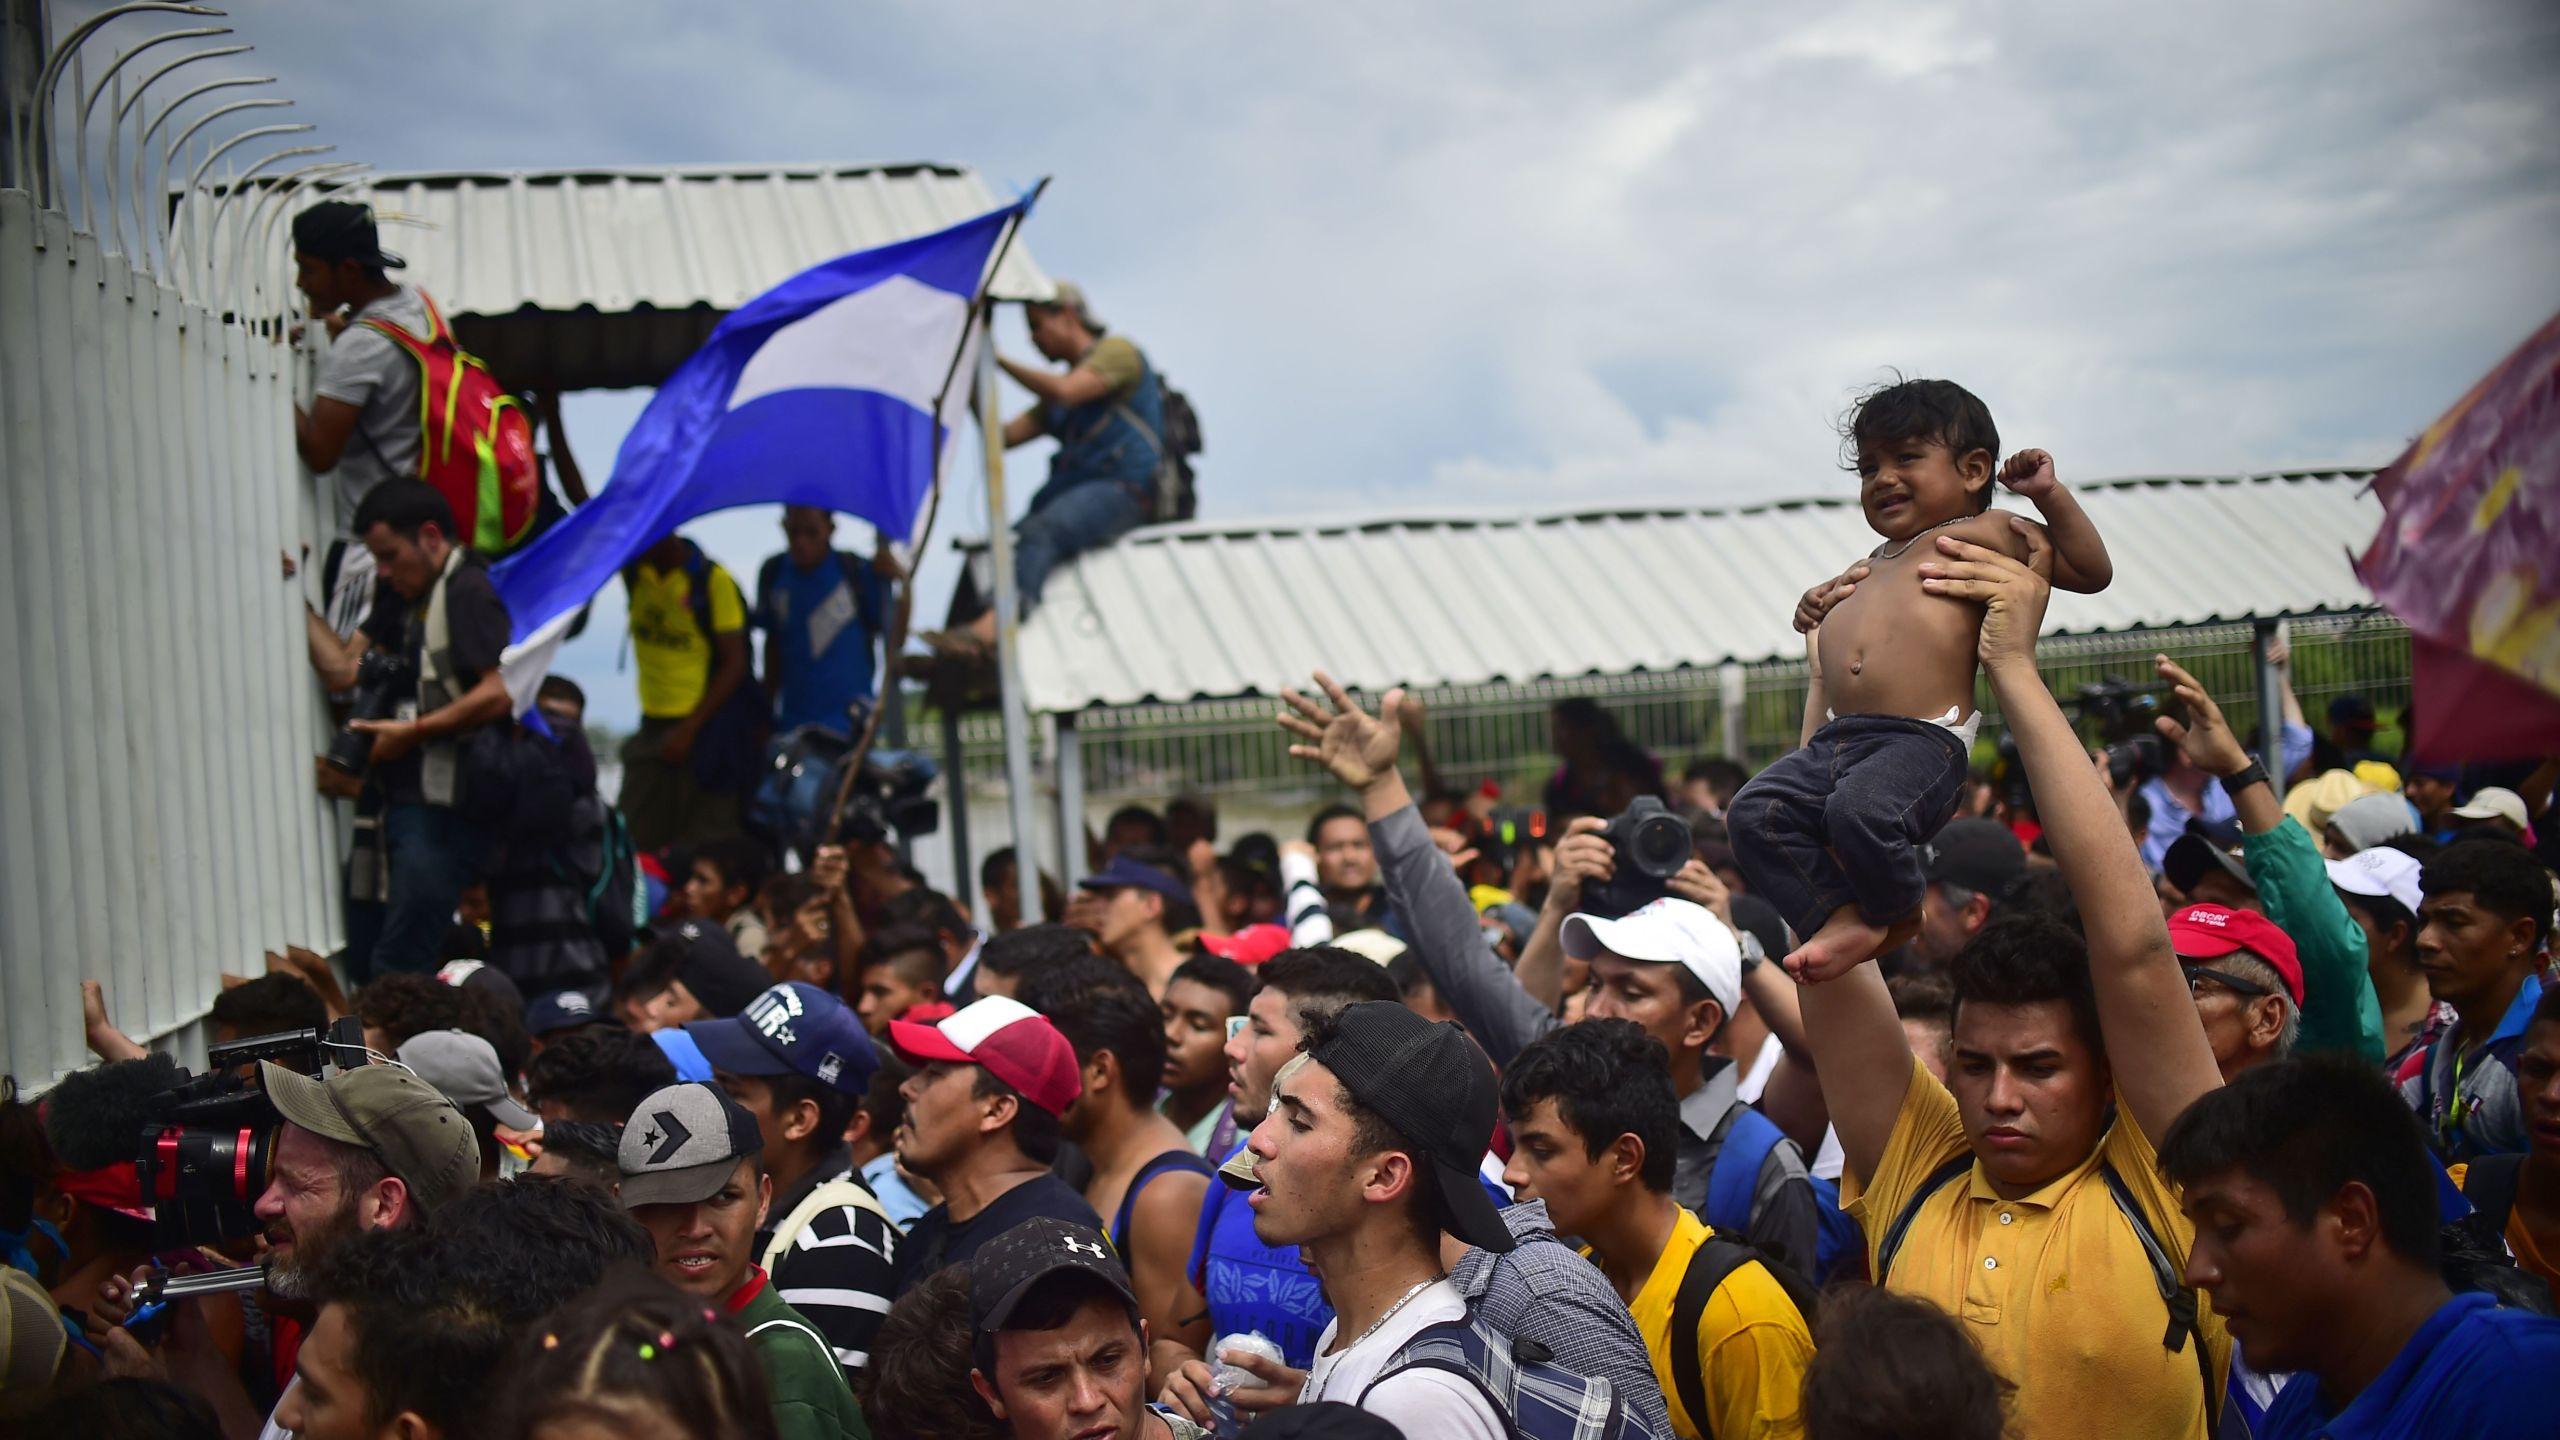 Honduran migrants heading in a caravan to the U.S. climb the gate of the Guatemala-Mexico international border bridge in Ciudad Hidalgo, Chiapas state, Mexico, on Oct. 19, 2018. (Credit: PEDRO PARDO/AFP/Getty Images)